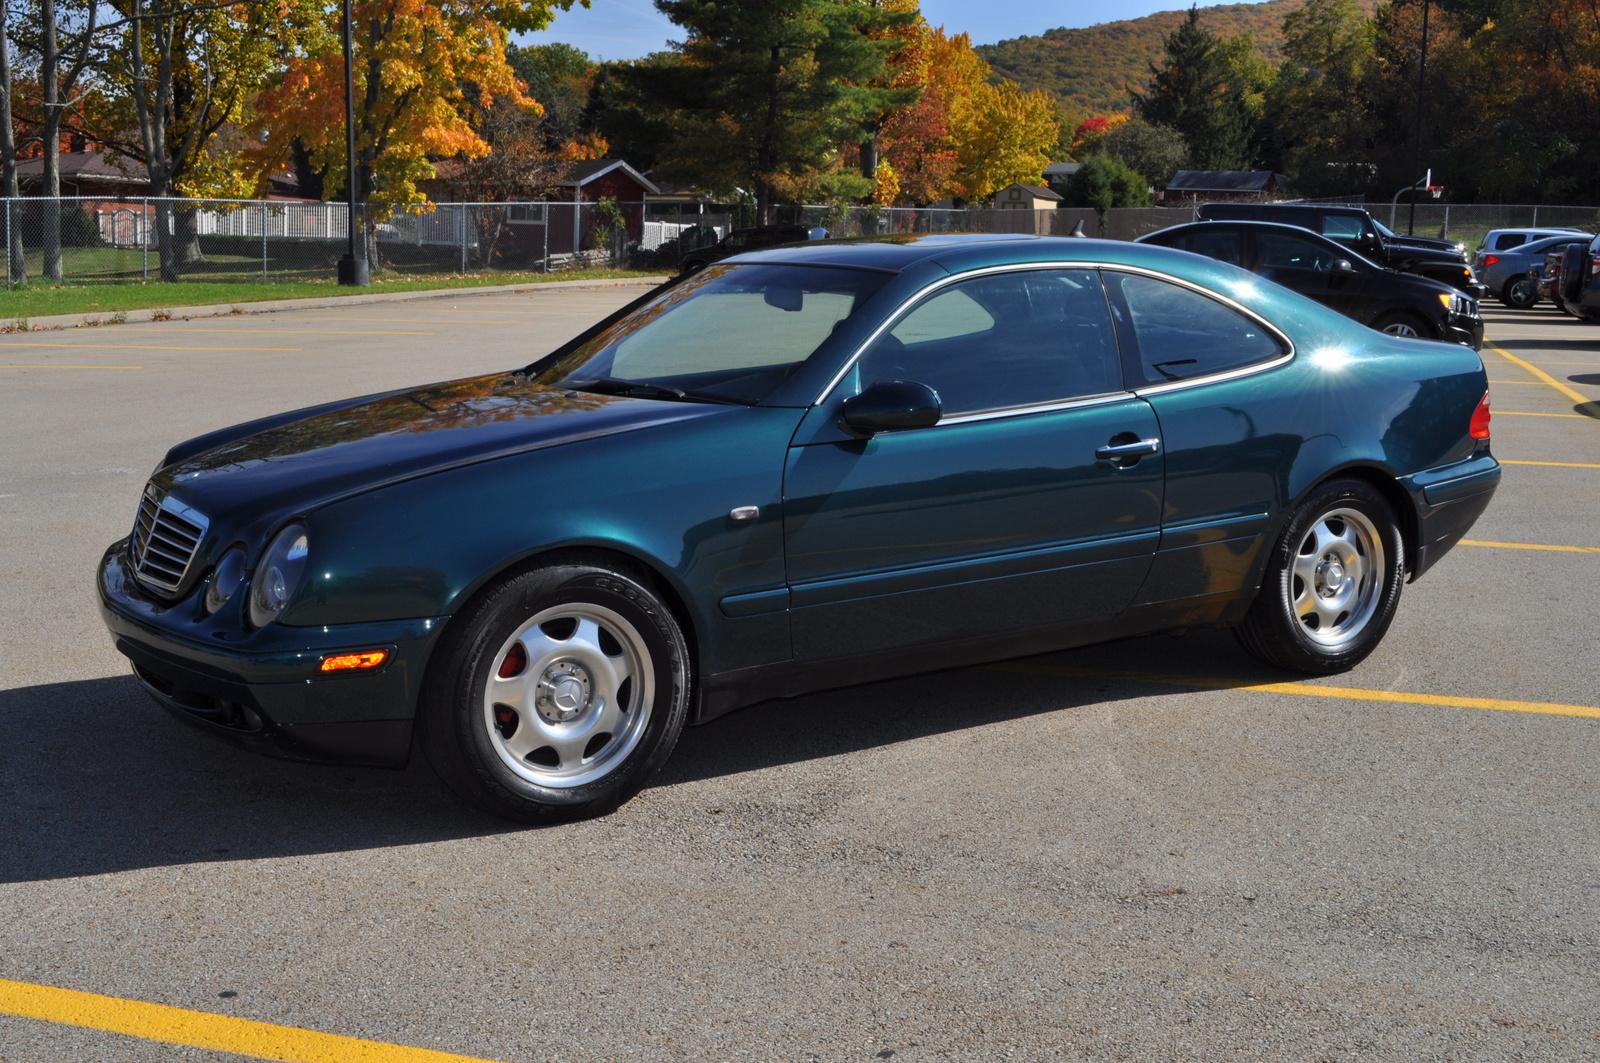 1998 mercedes benz clk class pictures cargurus for Mercedes benz 1998